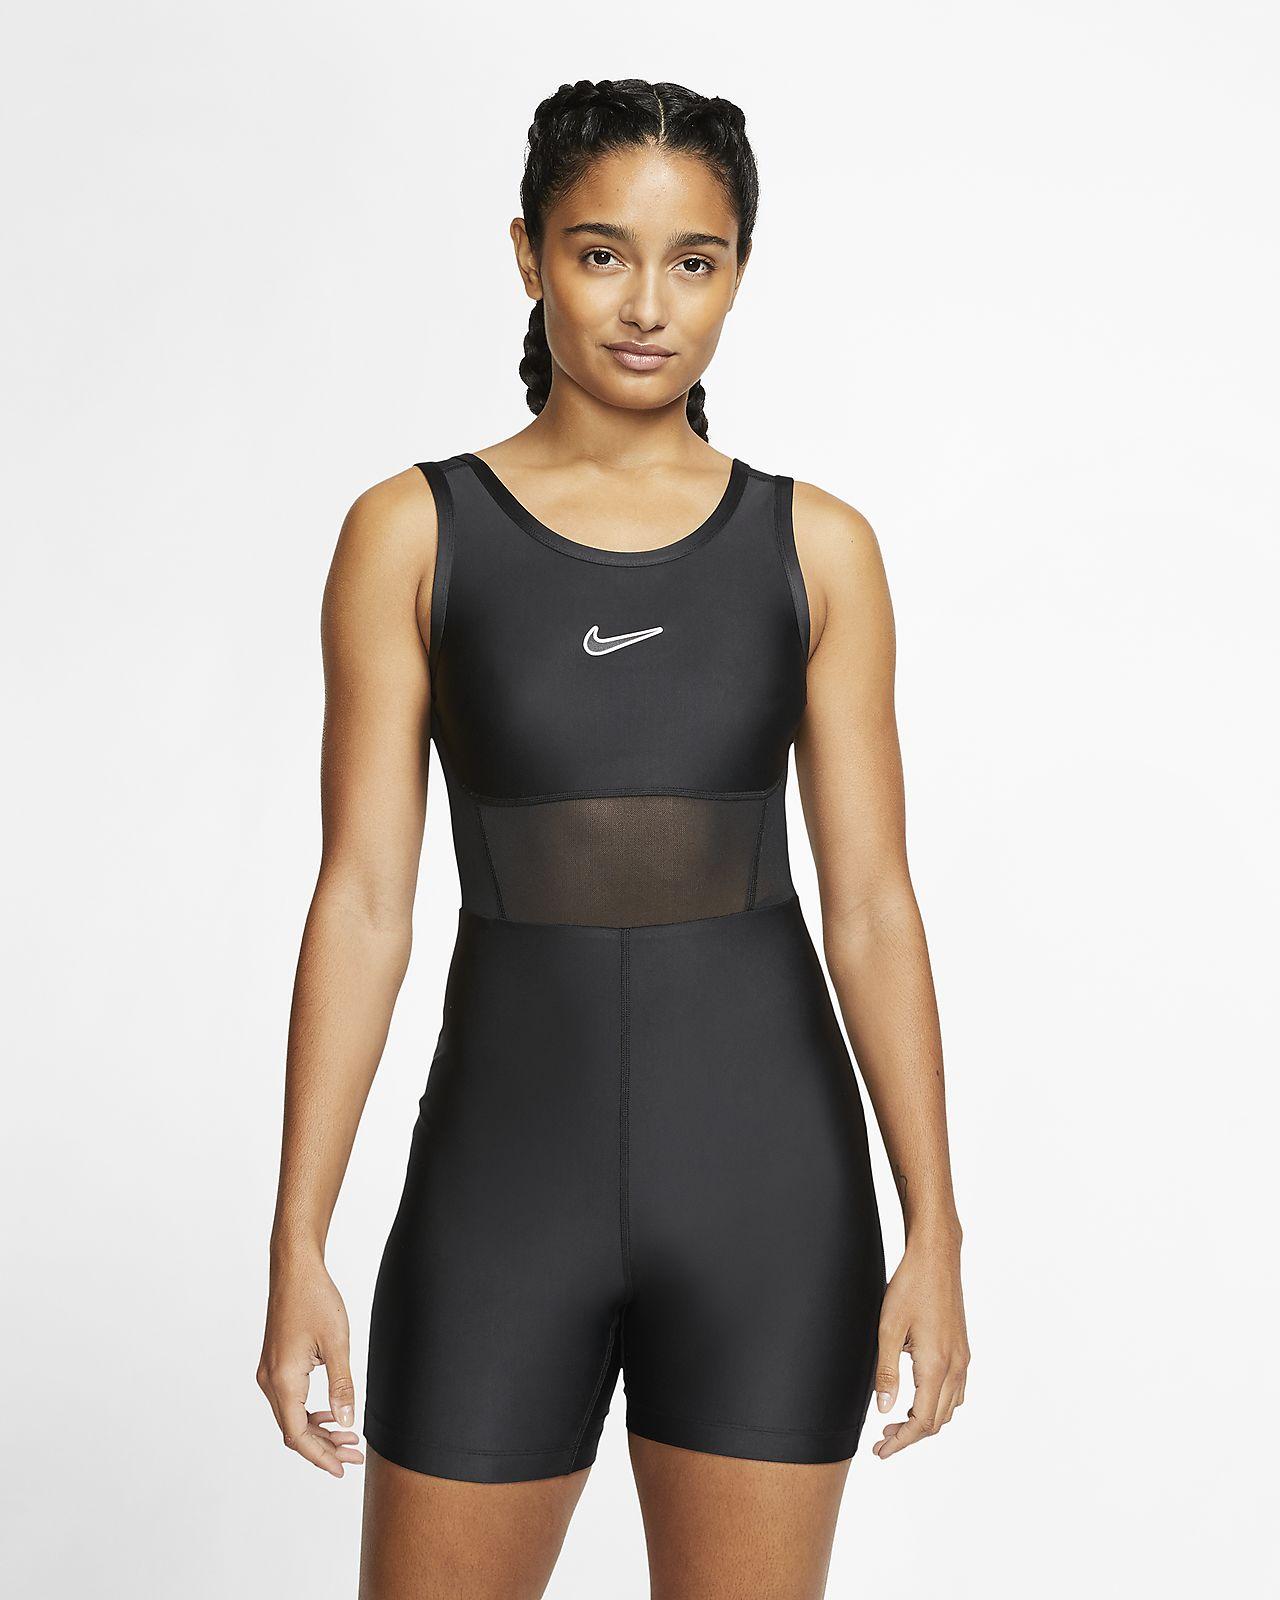 NikeCourt Women's Tennis Bodysuit